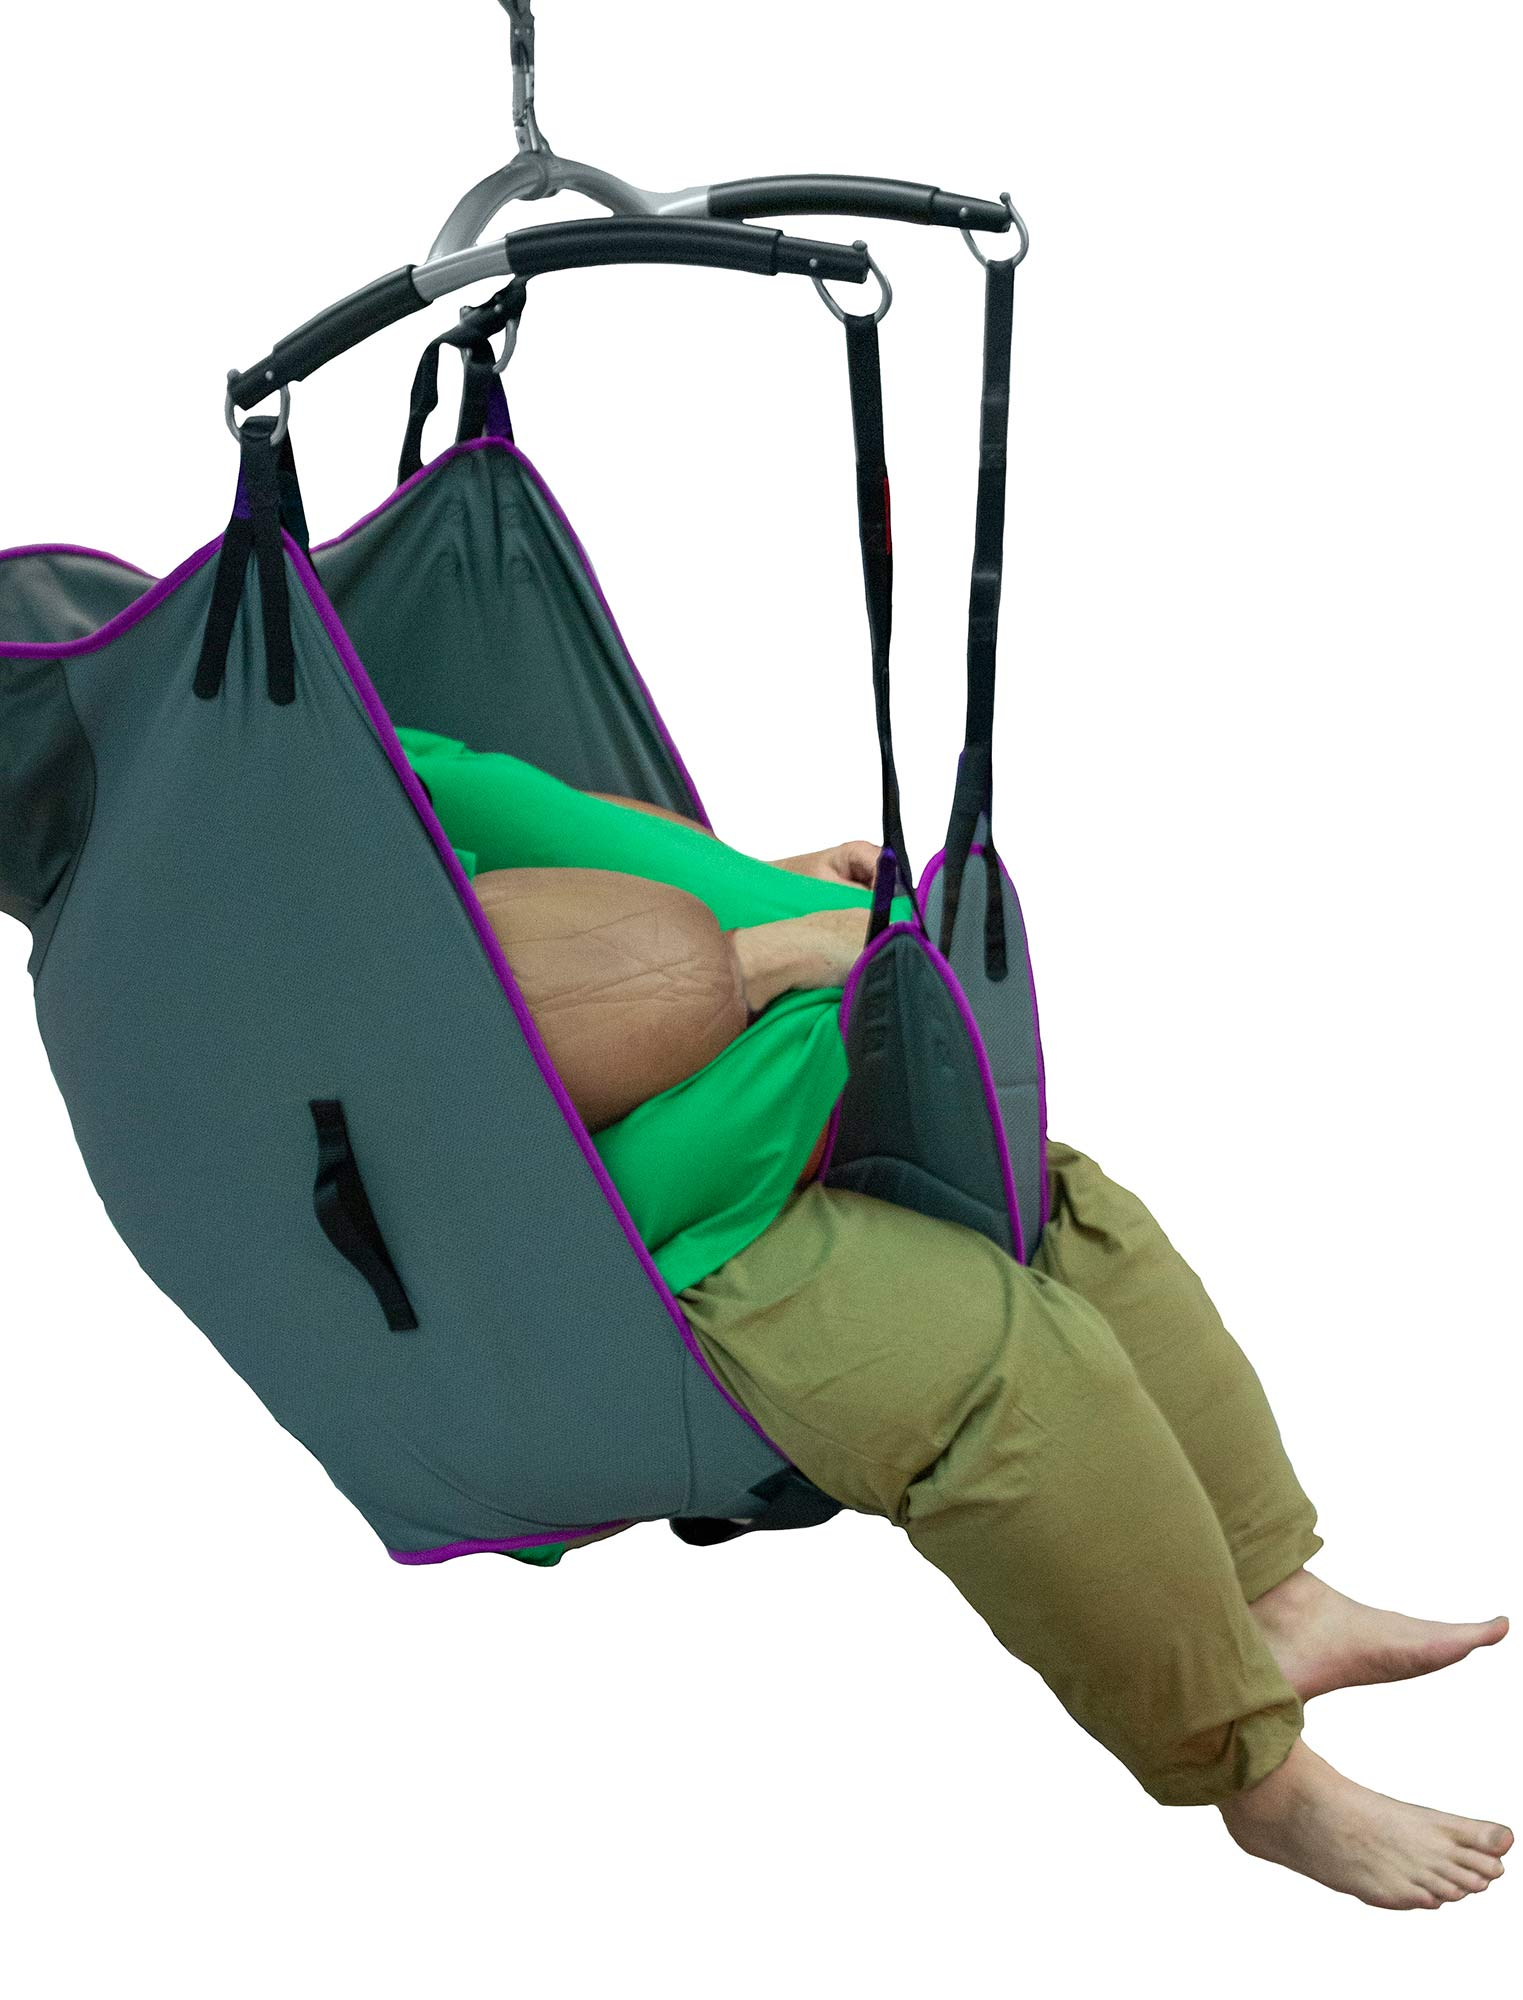 Bariatric seat sling